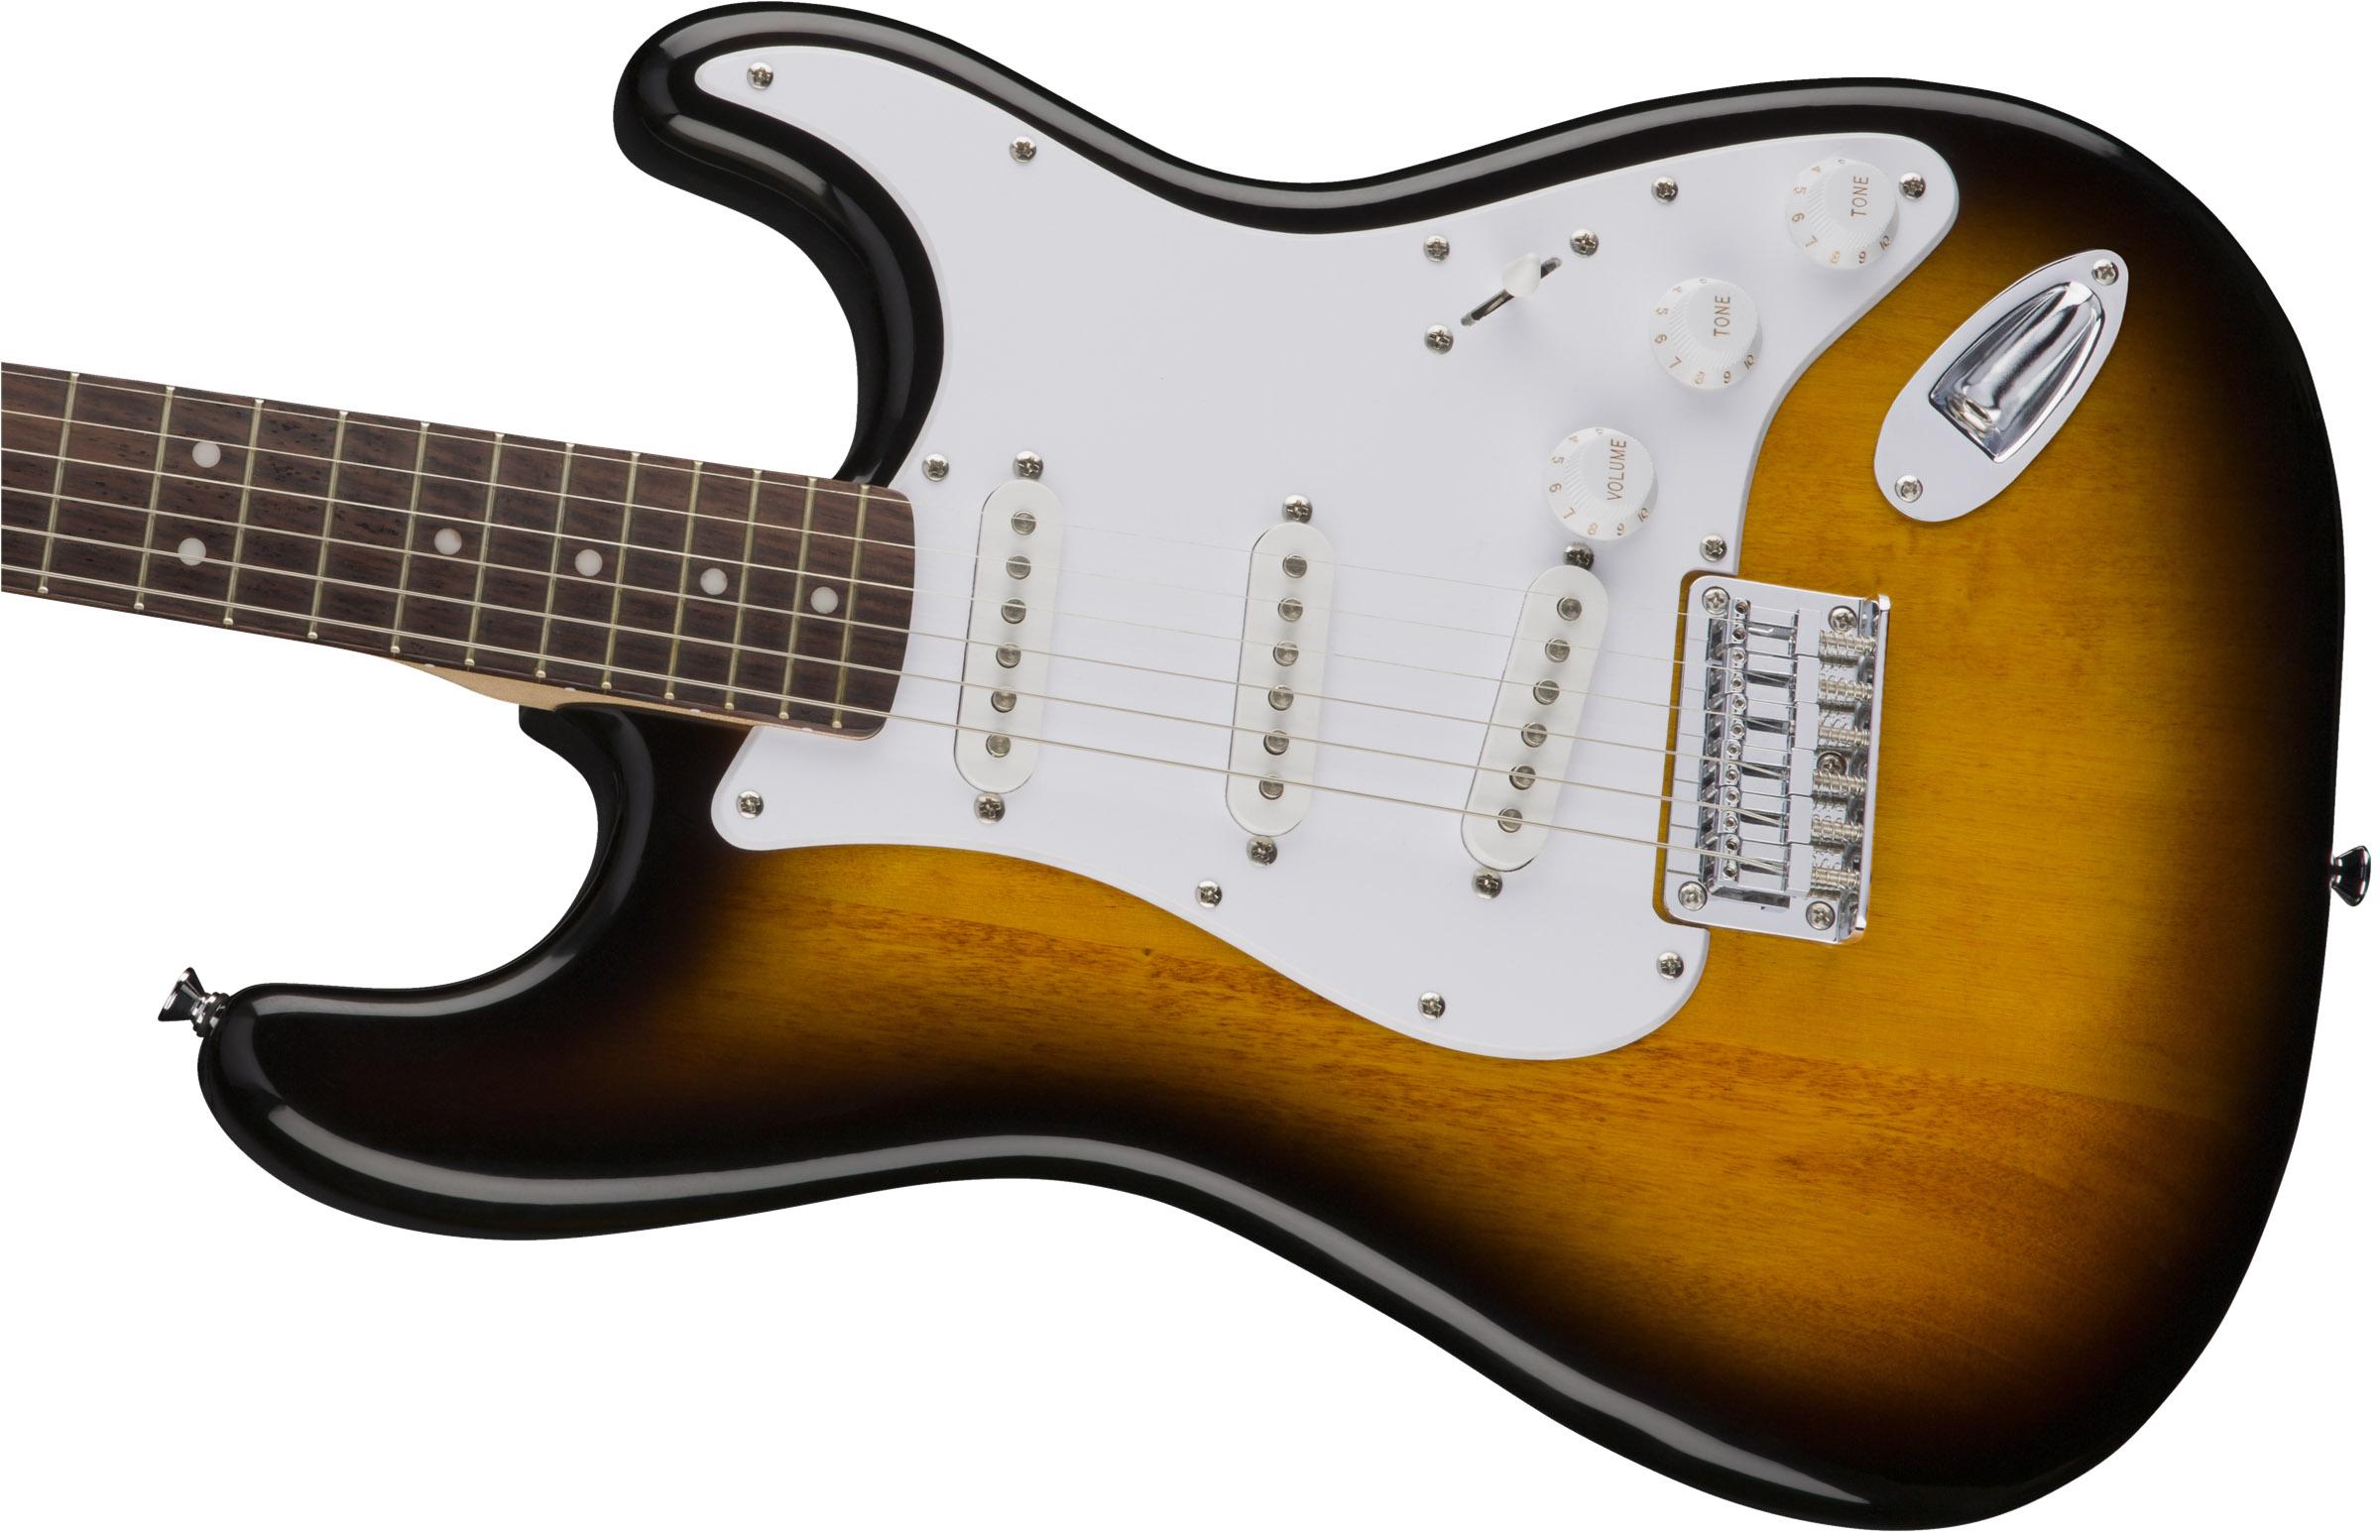 thumbnail 6 - Fender Squier Bullet Stratocaster HT - Sunburst w/ Frontman 10G Amplifier